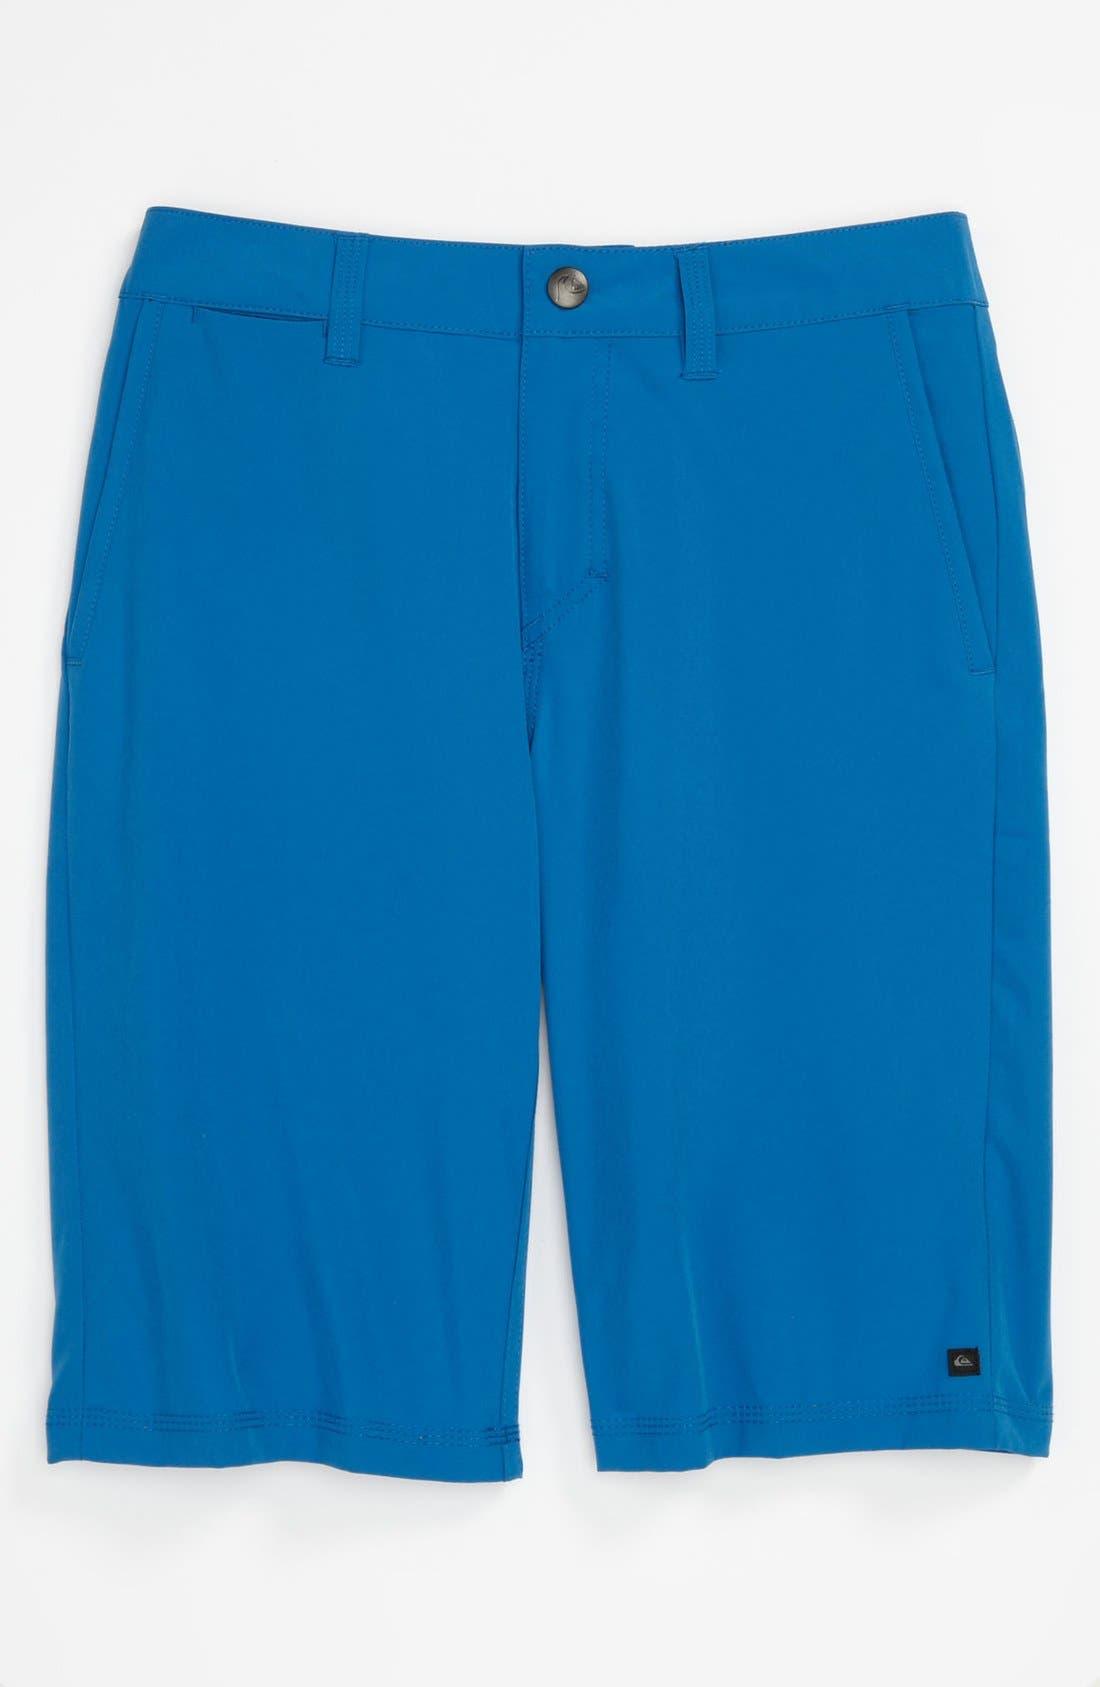 Main Image - Quiksilver 'F.A.A.' Water Repellent Shorts (Big Boys)